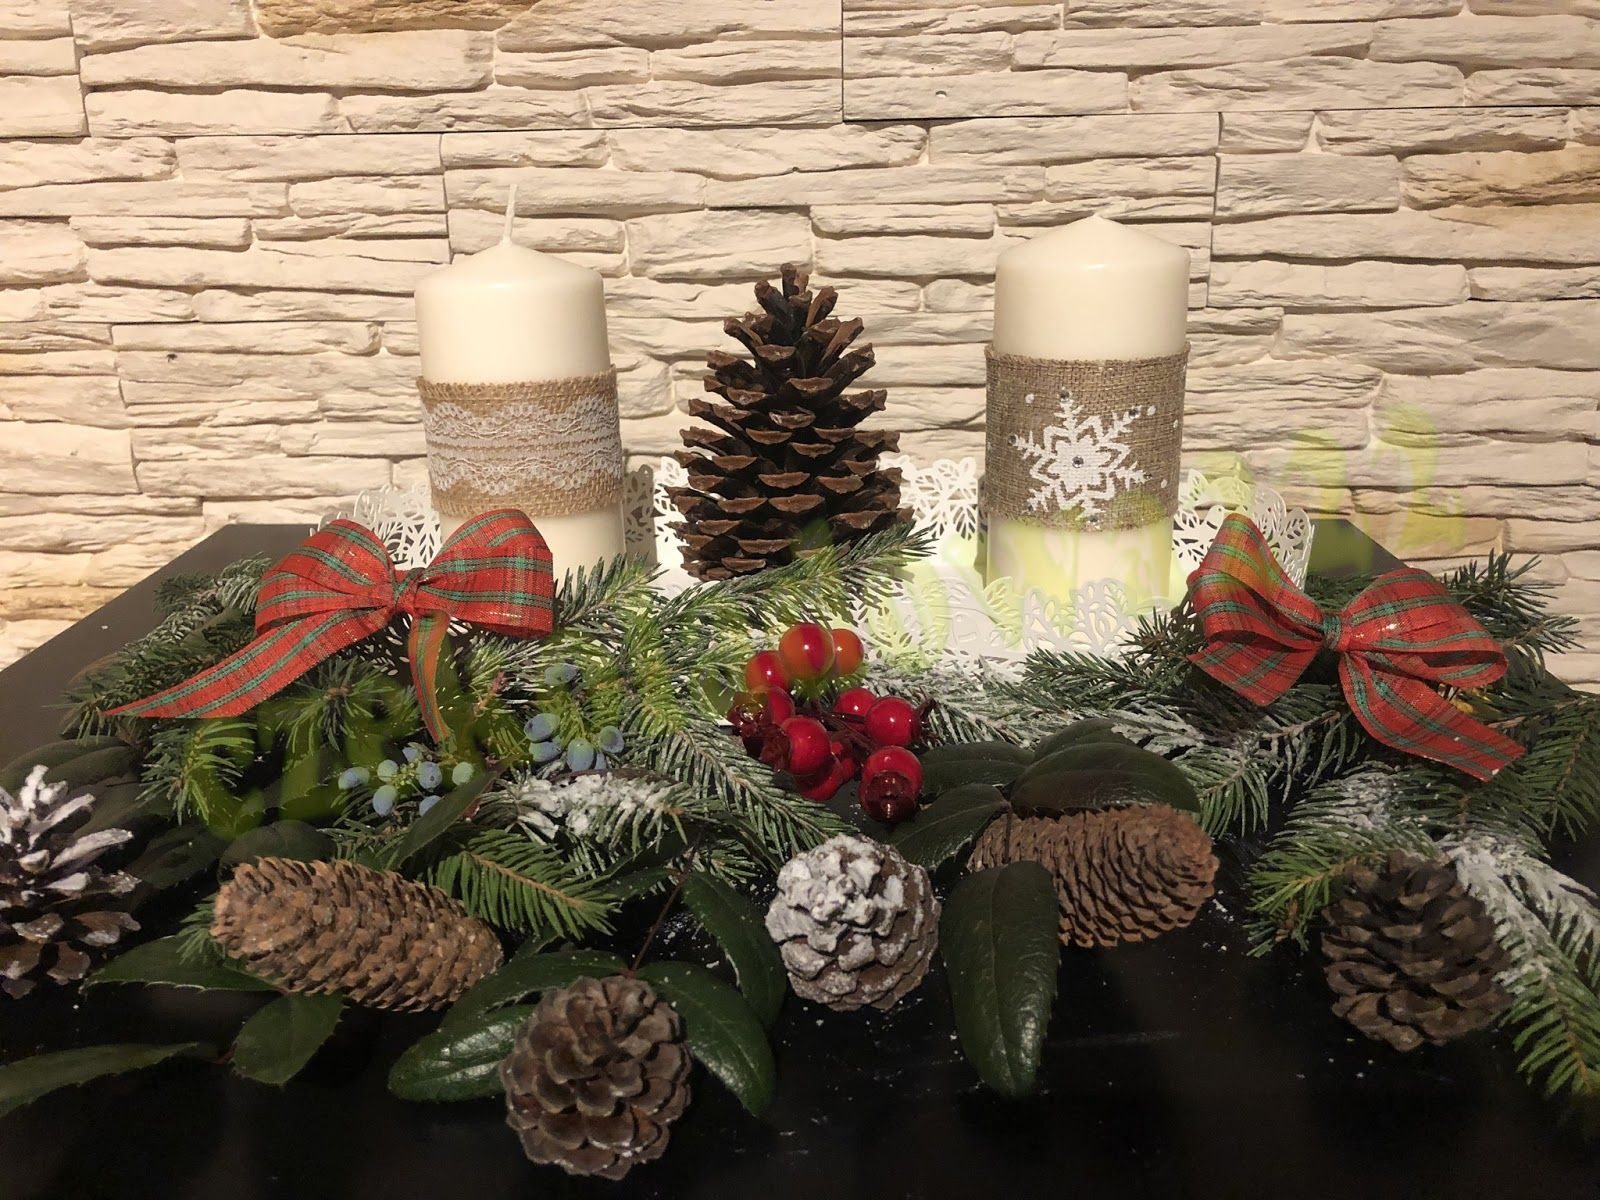 Christmas Candle Swiece Bozonarodzeniowe Diy Diy Candles Table Decorations Decor